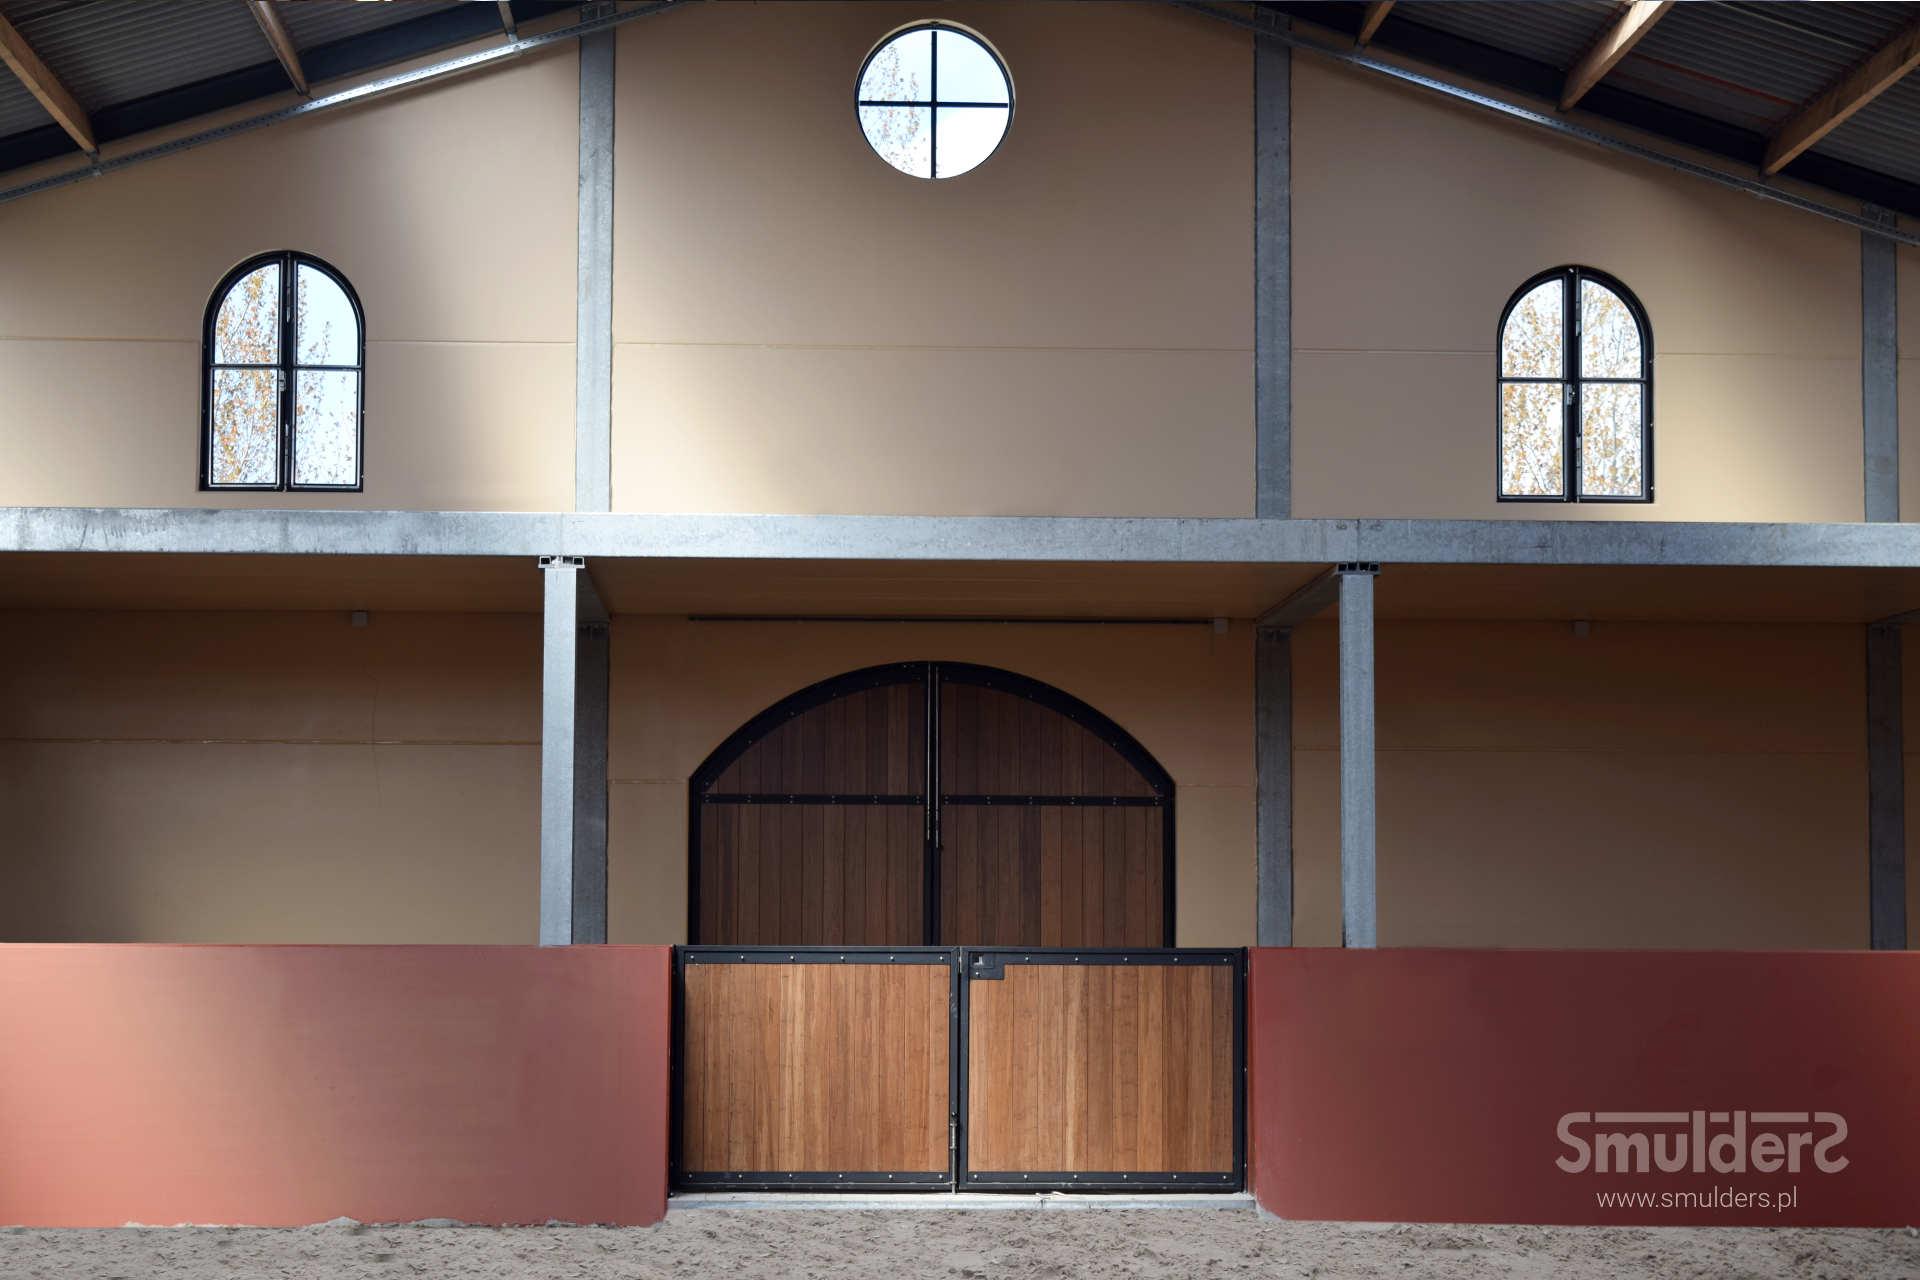 https://www.smulders.pl/wp-content/uploads/2019/03/f006_internal-stables_windsor_doors_windows_barn-doors_PRSH_SMULDERS_PL.jpg